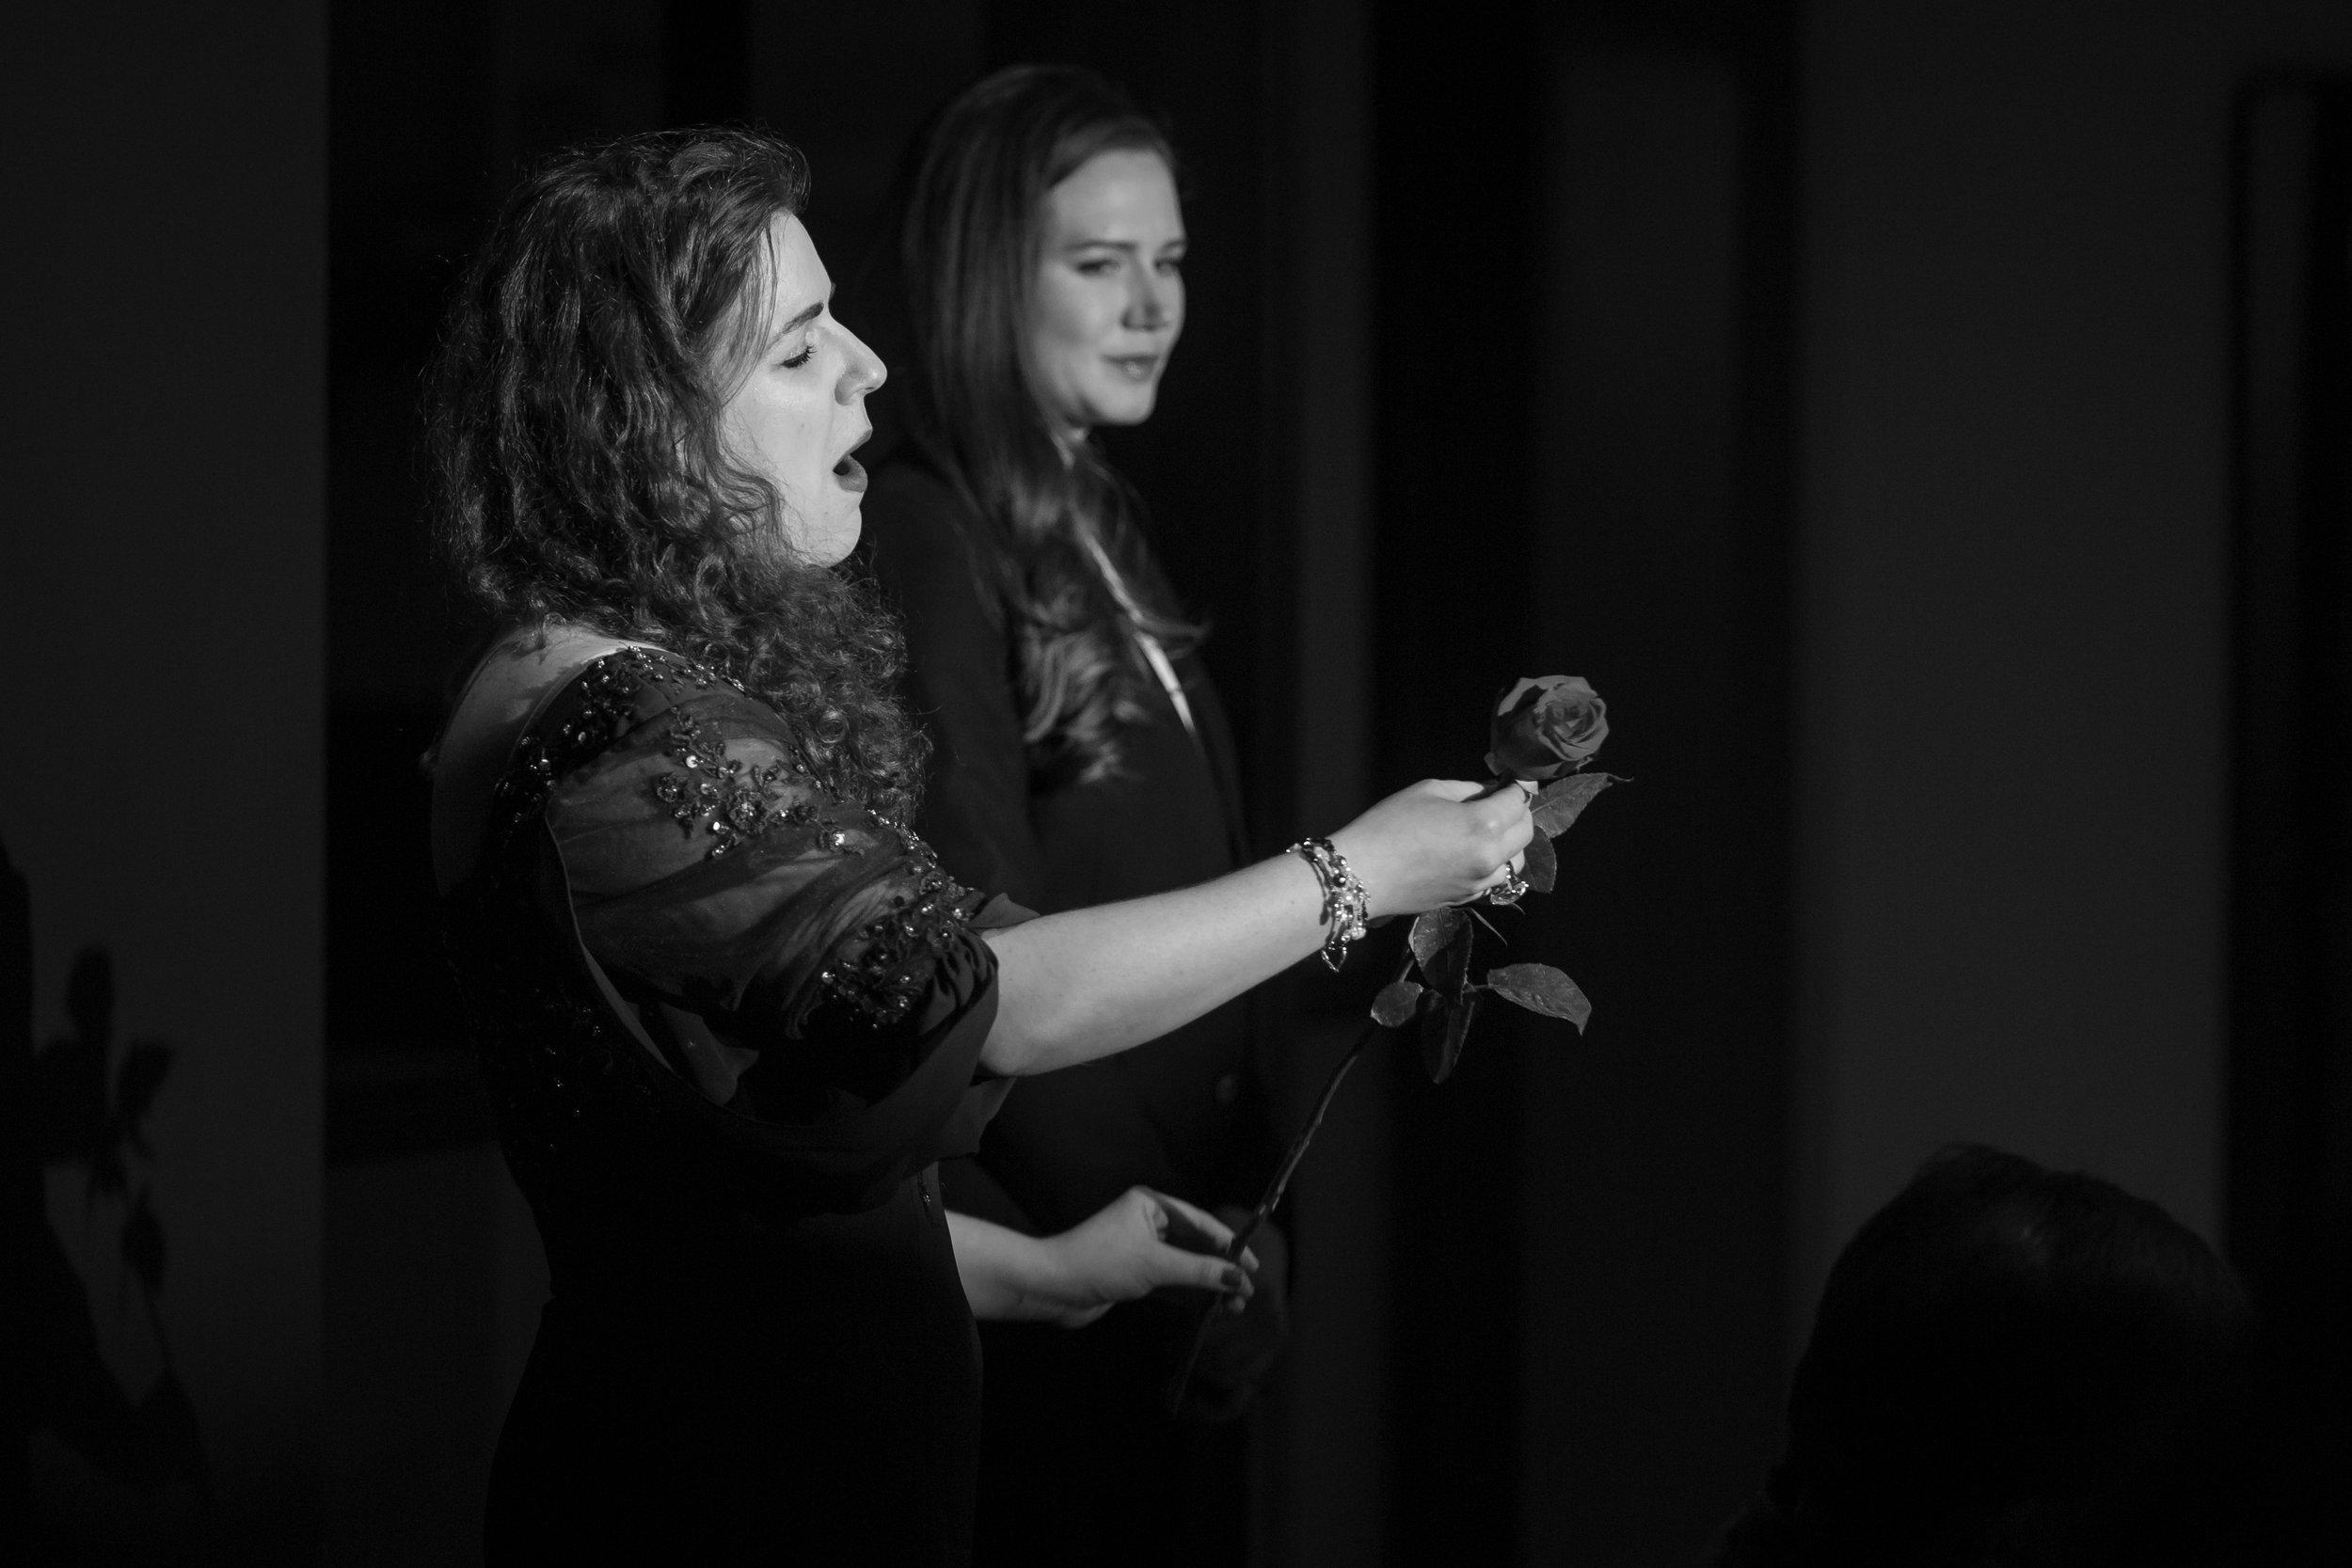 Presentation of the Rose, with mezzo-soprano Kirsten Scott as Octavian